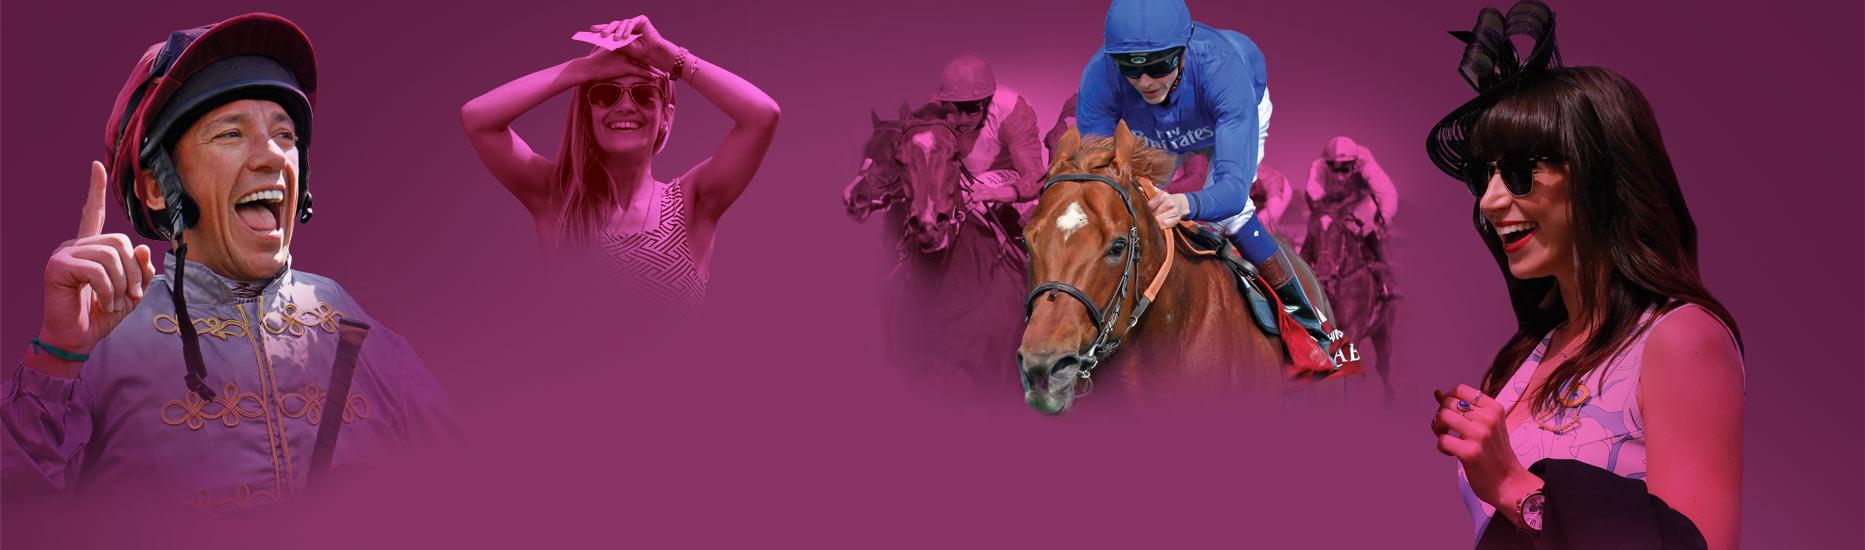 Al-Shaqab-Lockinge-Day-Raceday-Info